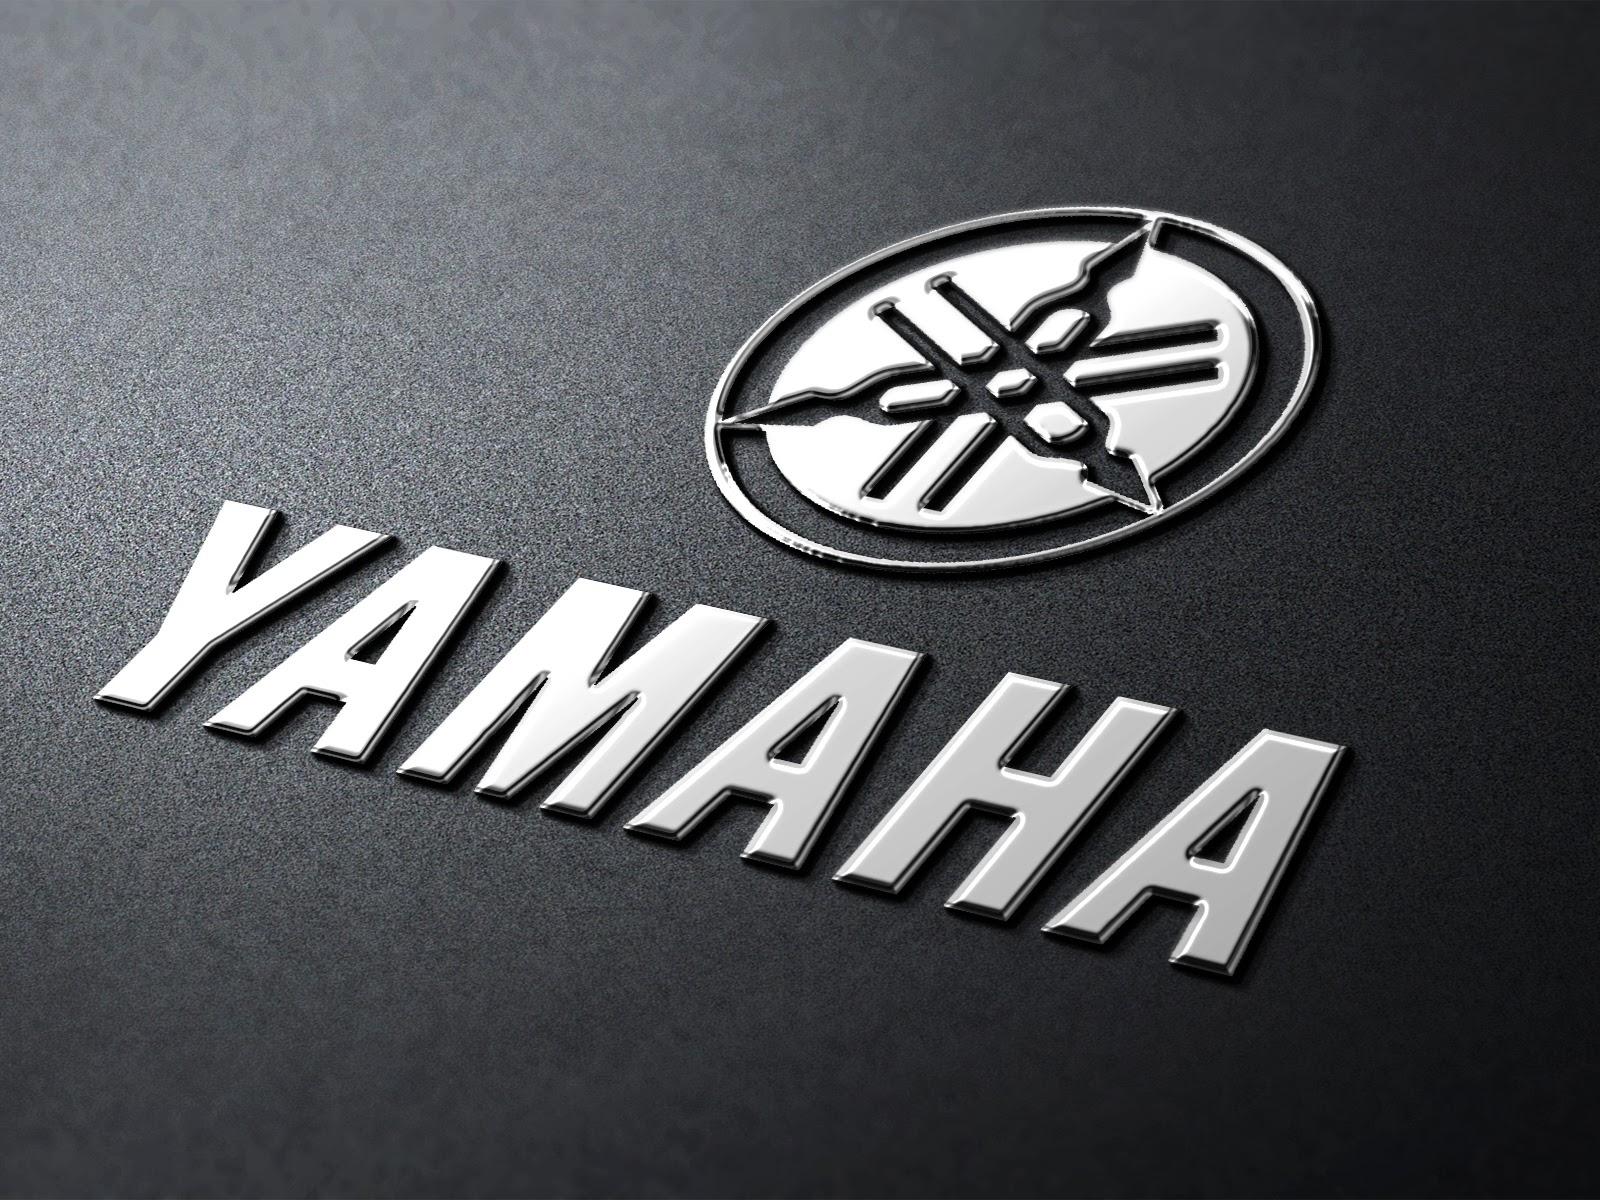 yamaha-logo-wallpaper-5.jpg